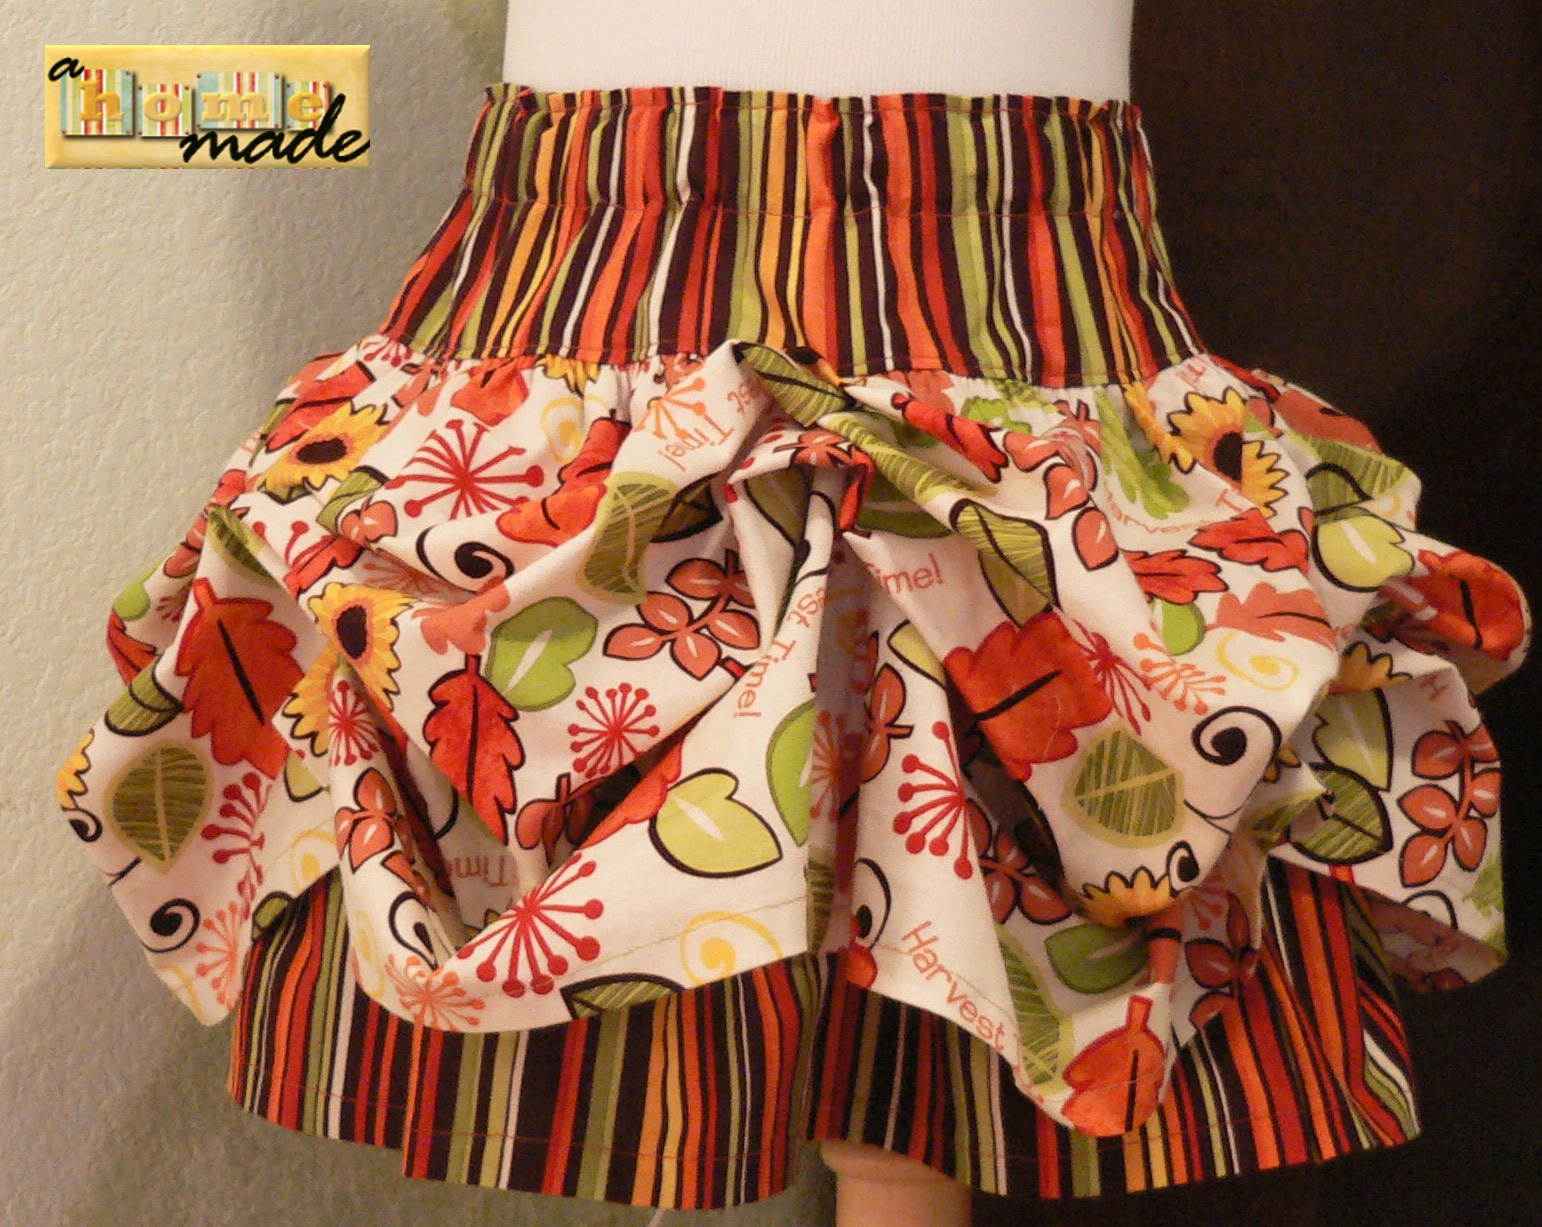 The Puffle Skirt